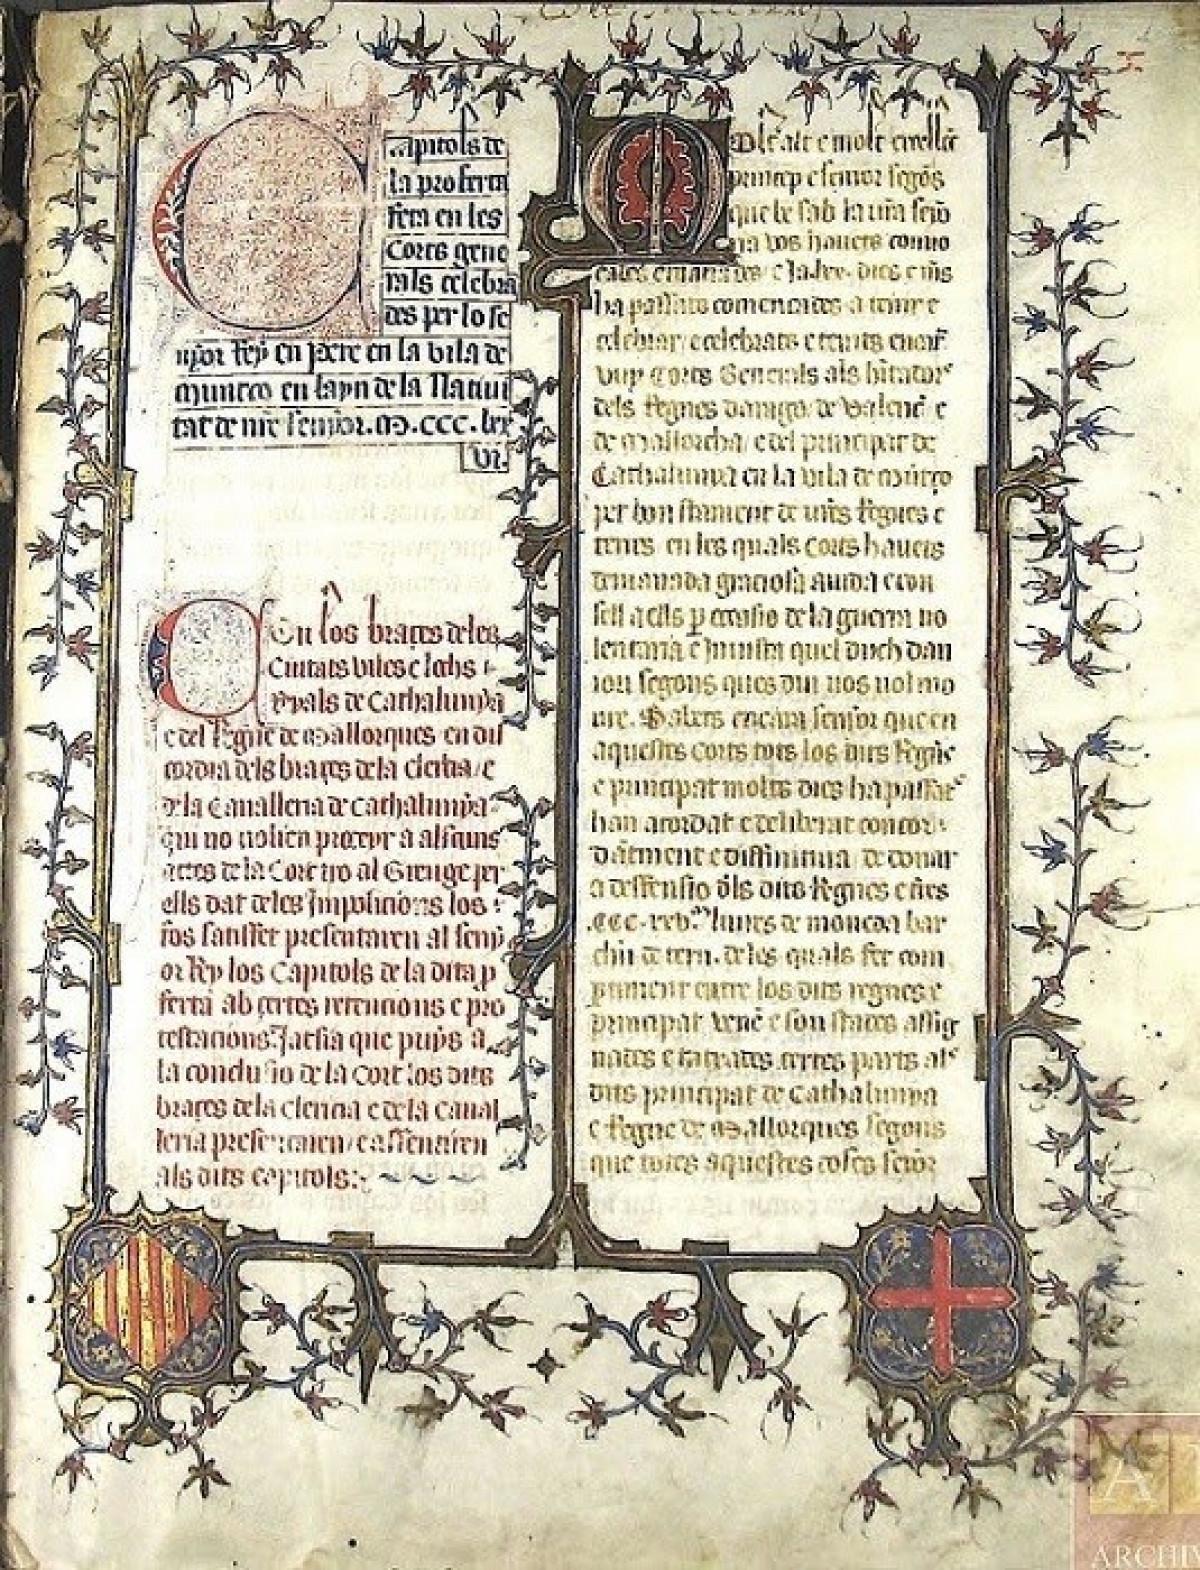 Manuscrito upf generalitat 12072018